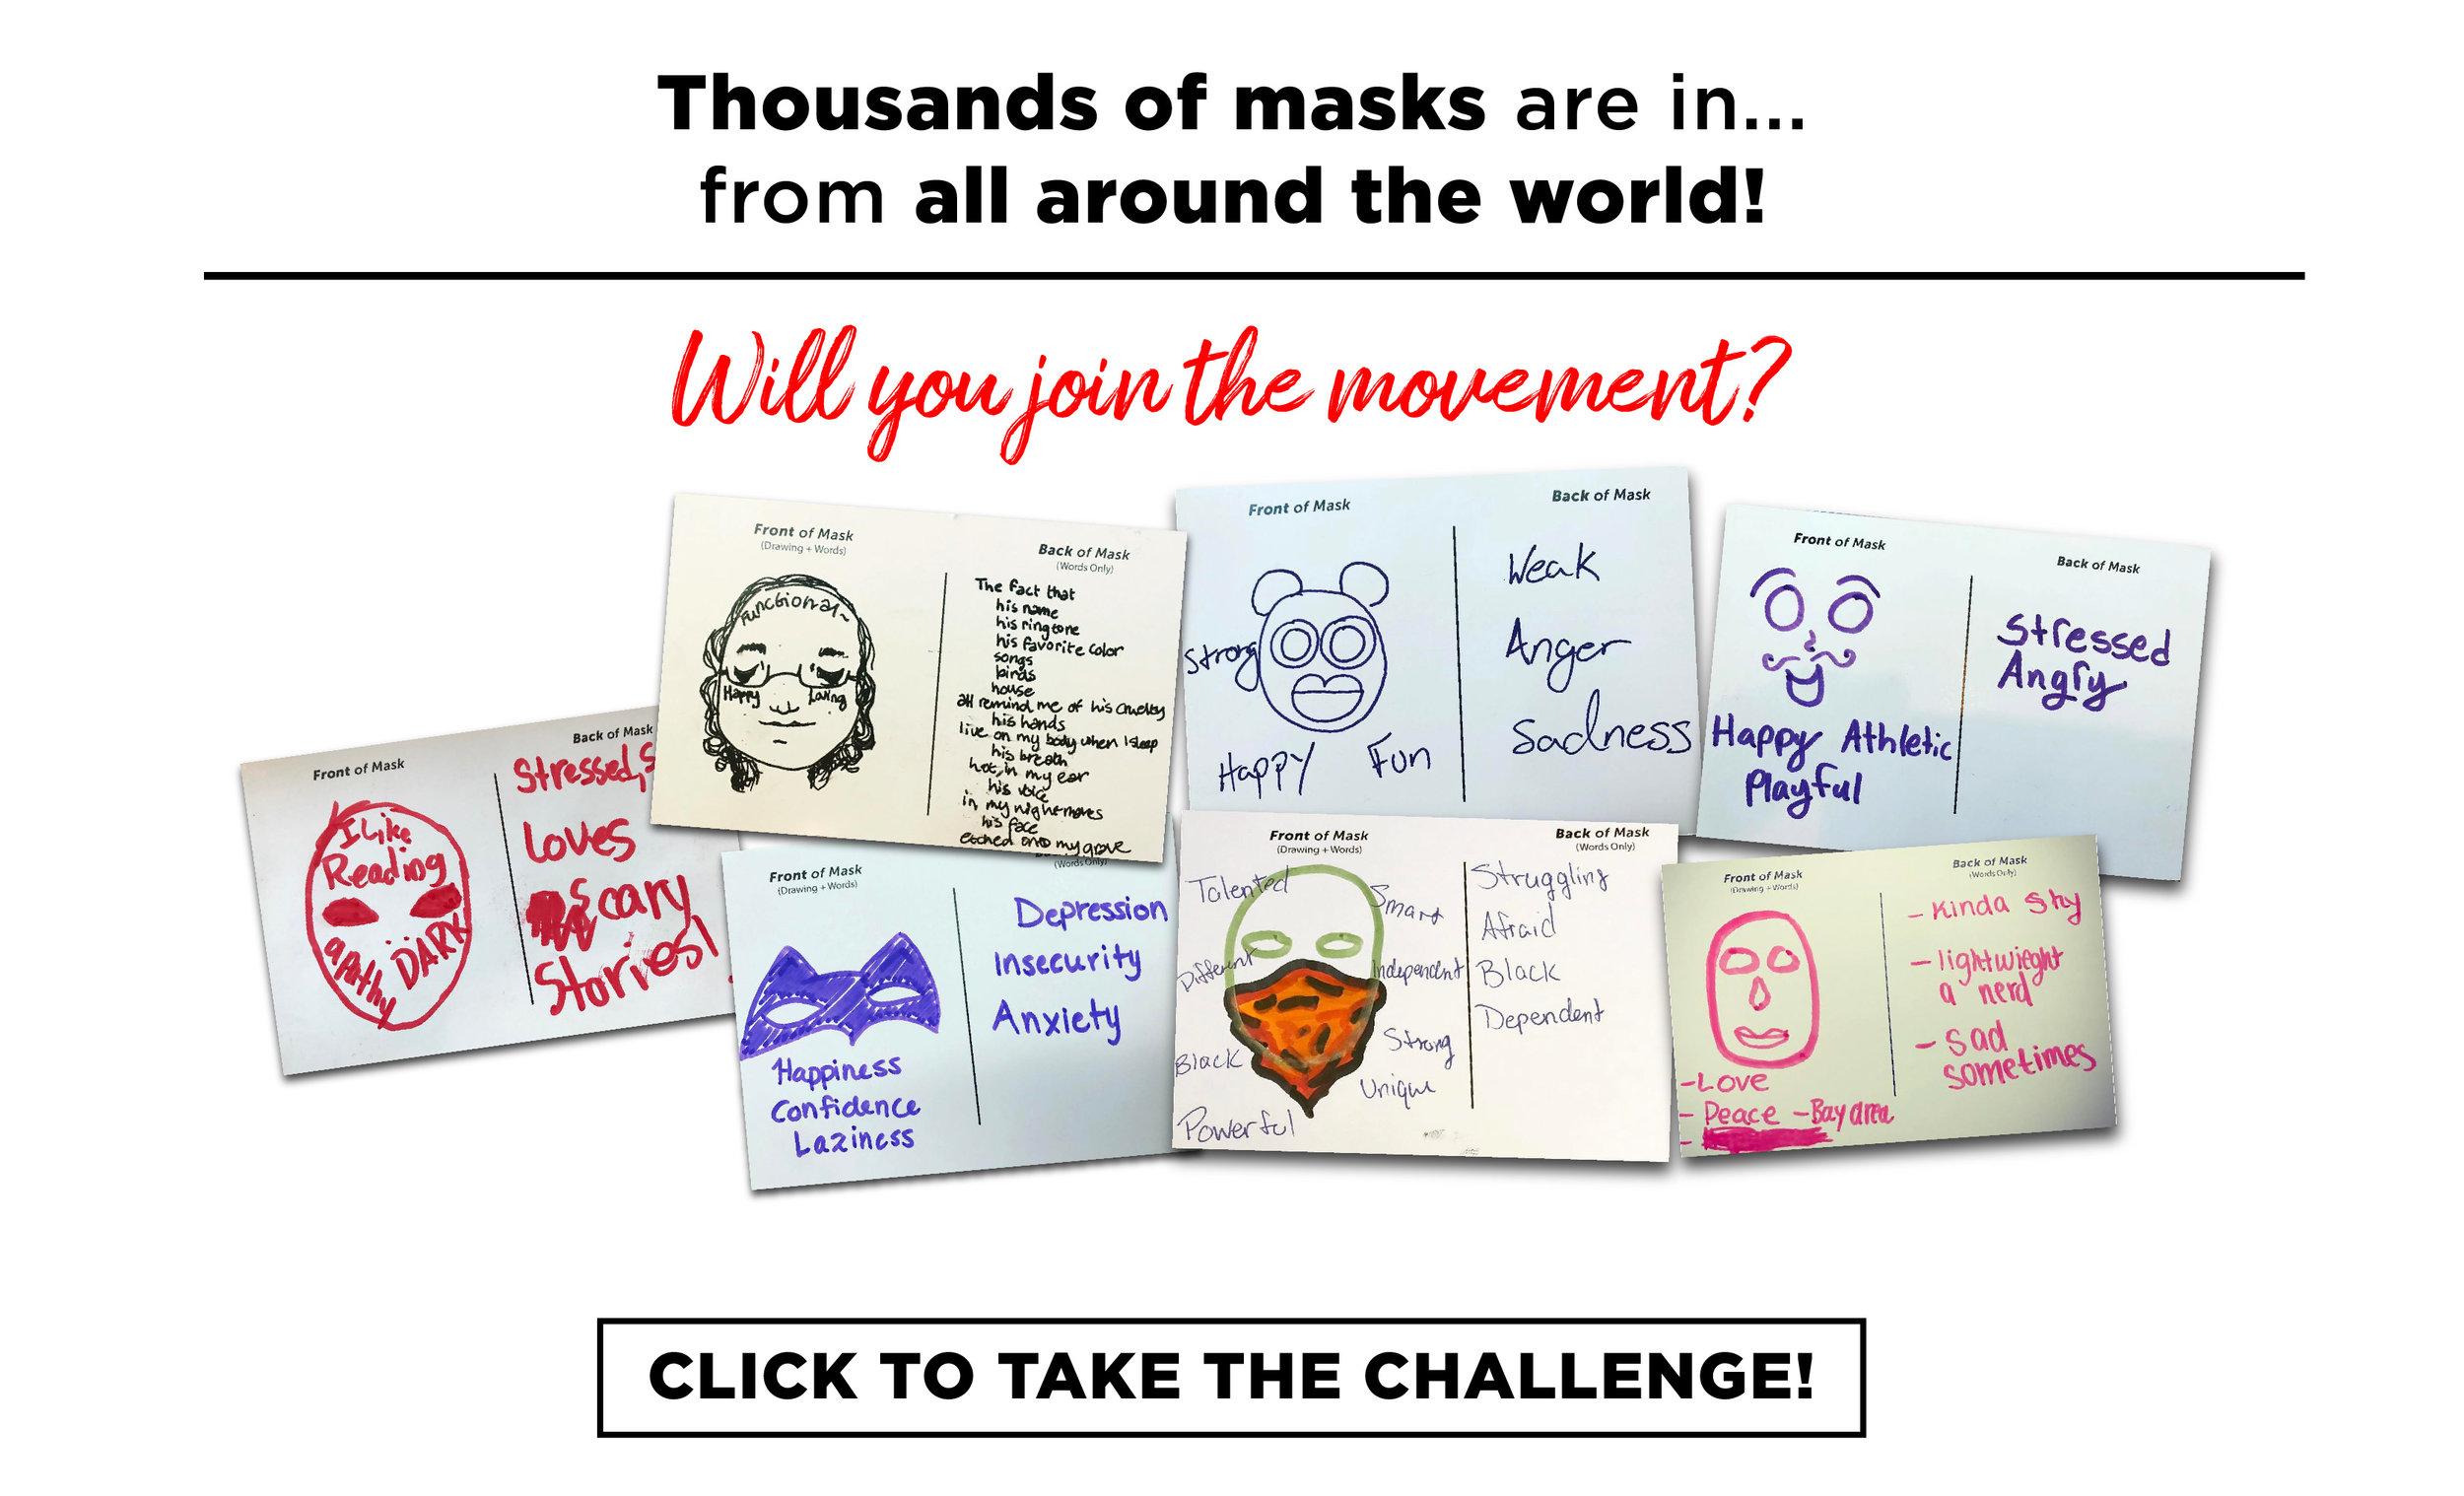 Masks from around the world promo-01.jpg